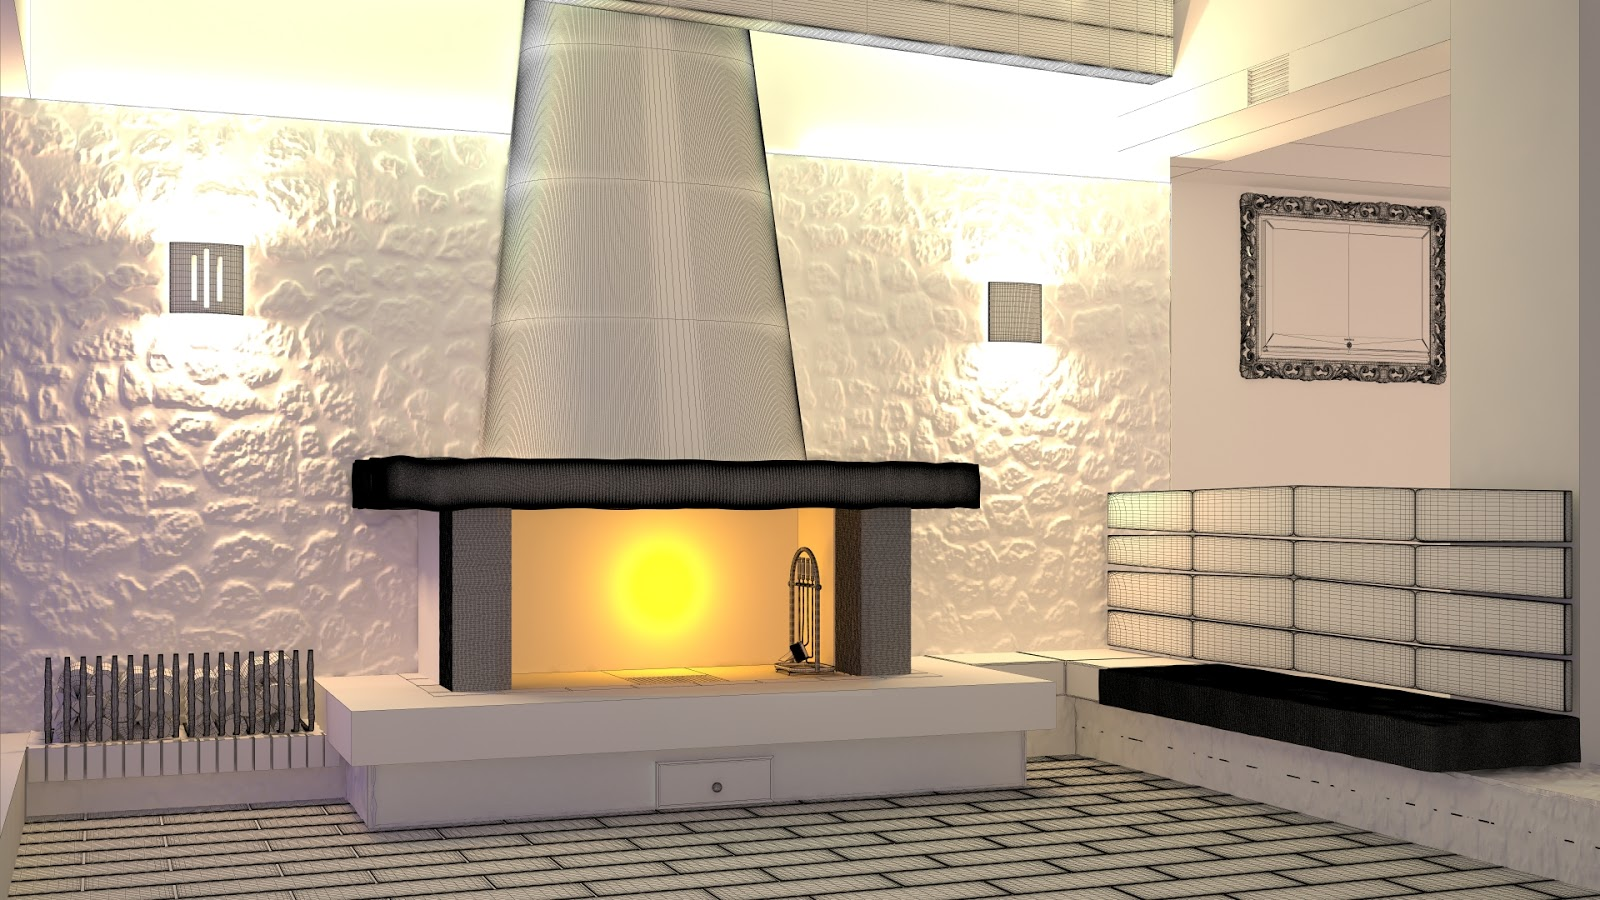 CG4ArchViz: Making of Fireplace